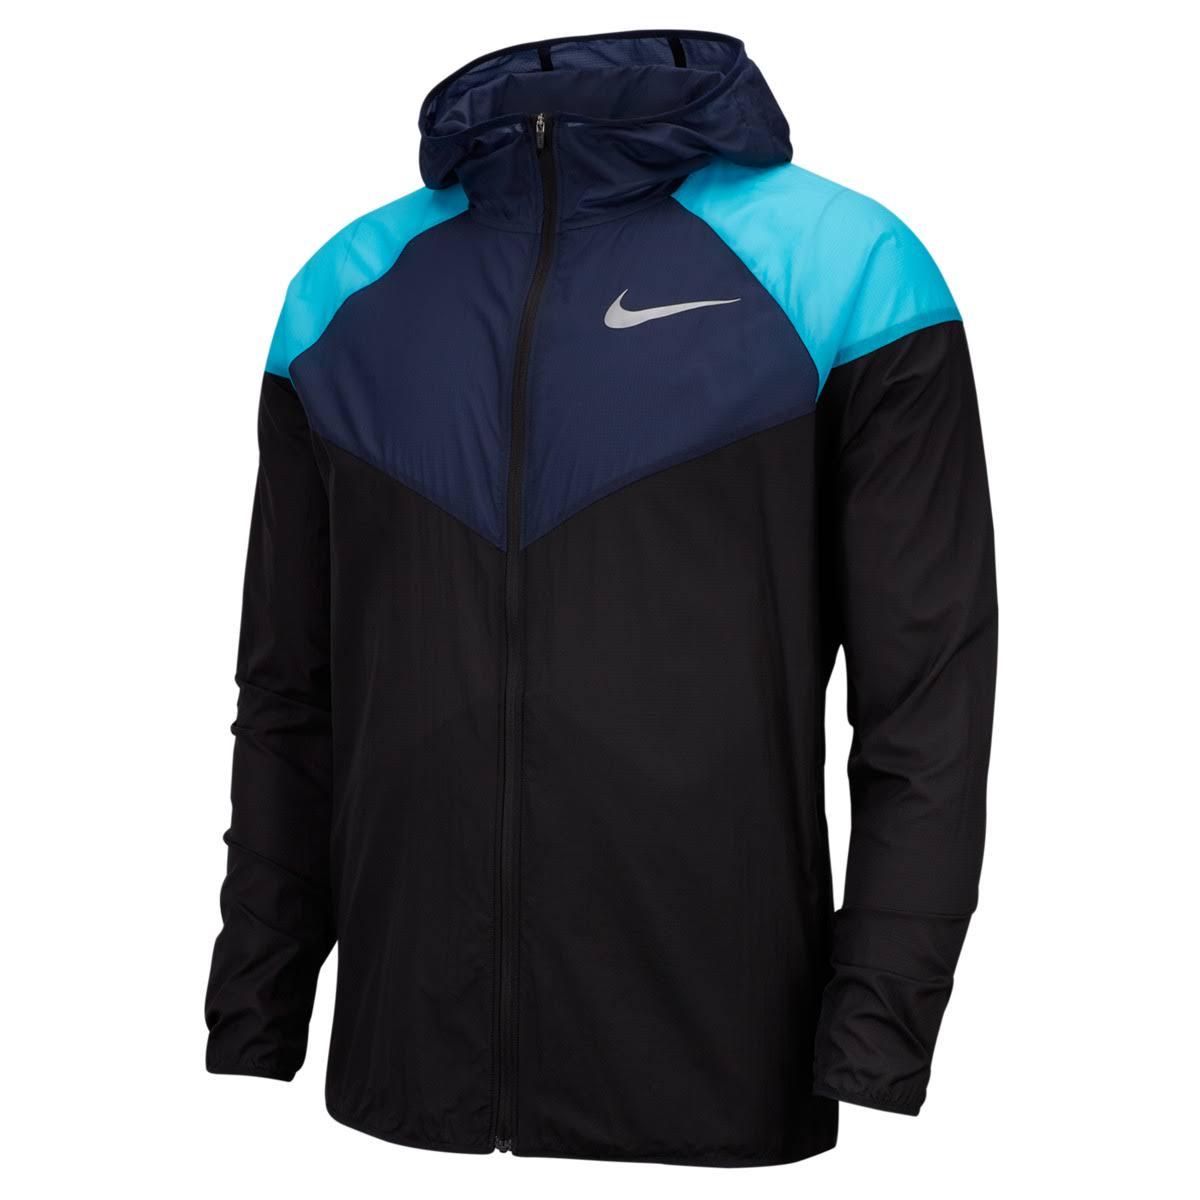 Jacket Negro Obsidiana S Reflectante Windrunner Talla Plata Mens Nike pwXUq5n